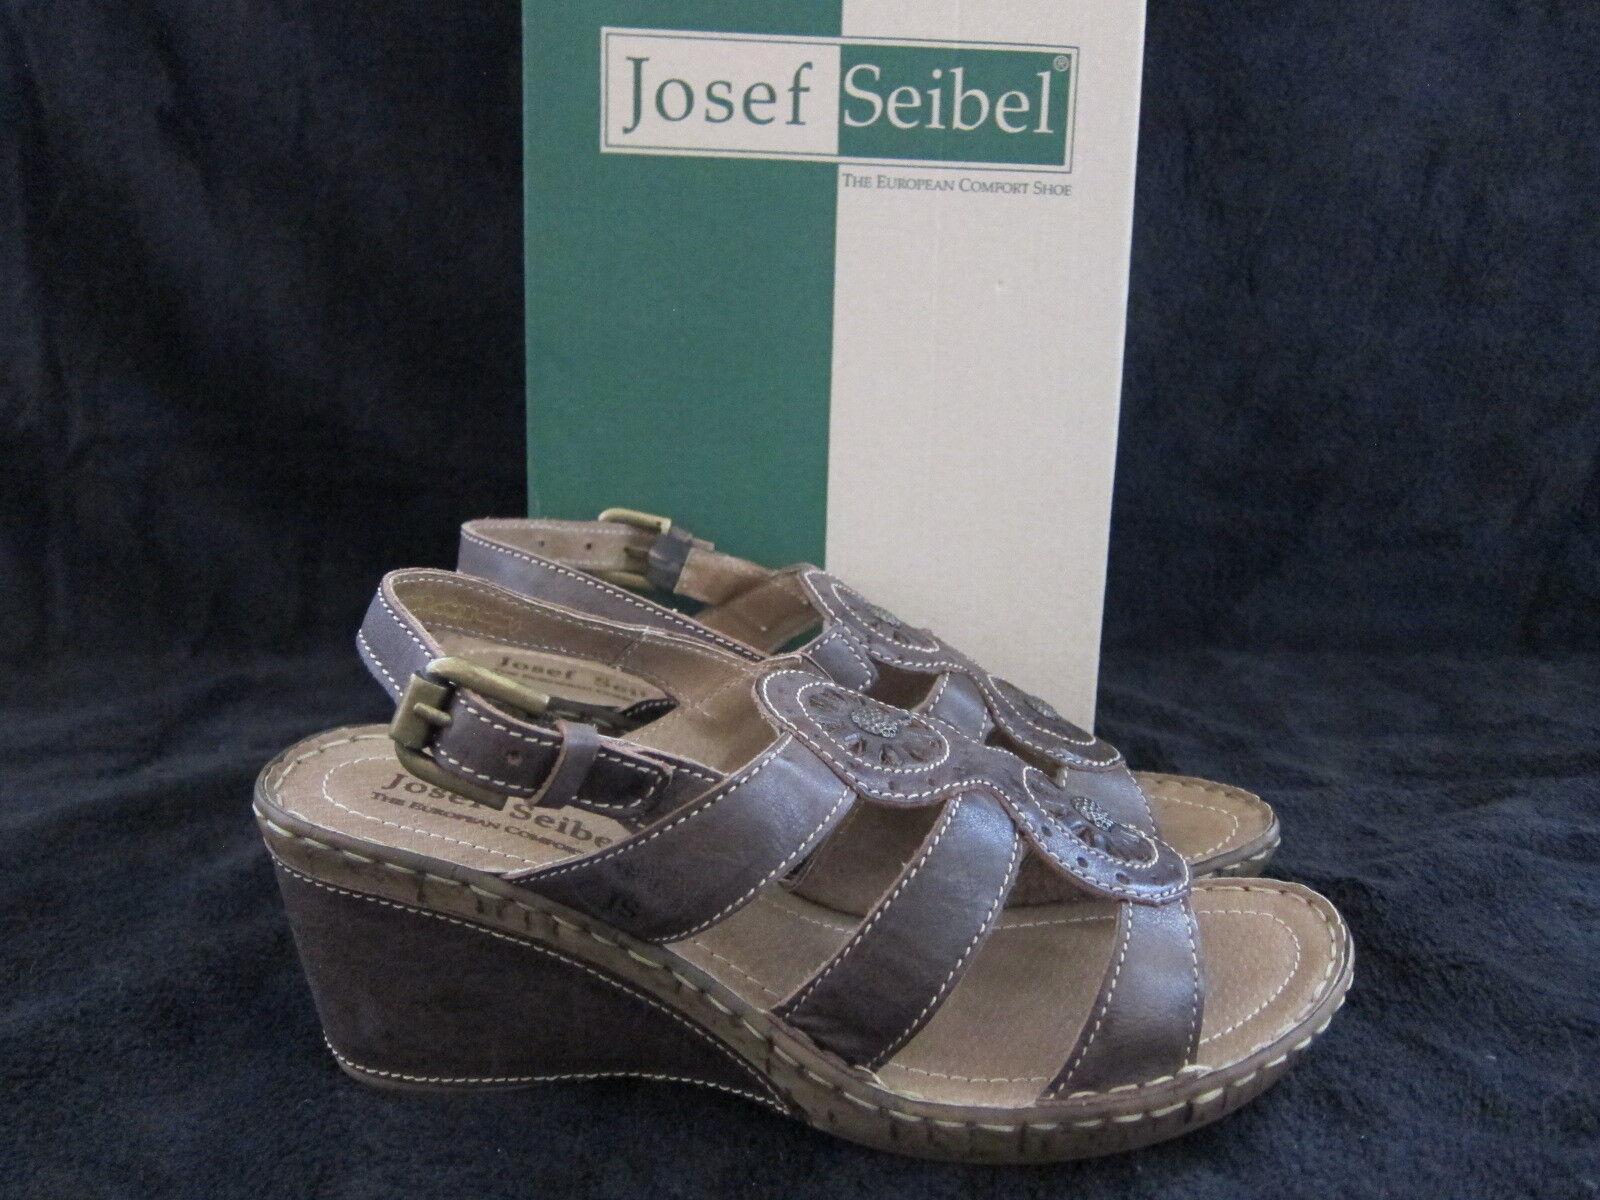 JOSEF SEIBEL Salma 08 Womens Espresso Sandals shoes Size US 9 - 9.5 M NWB